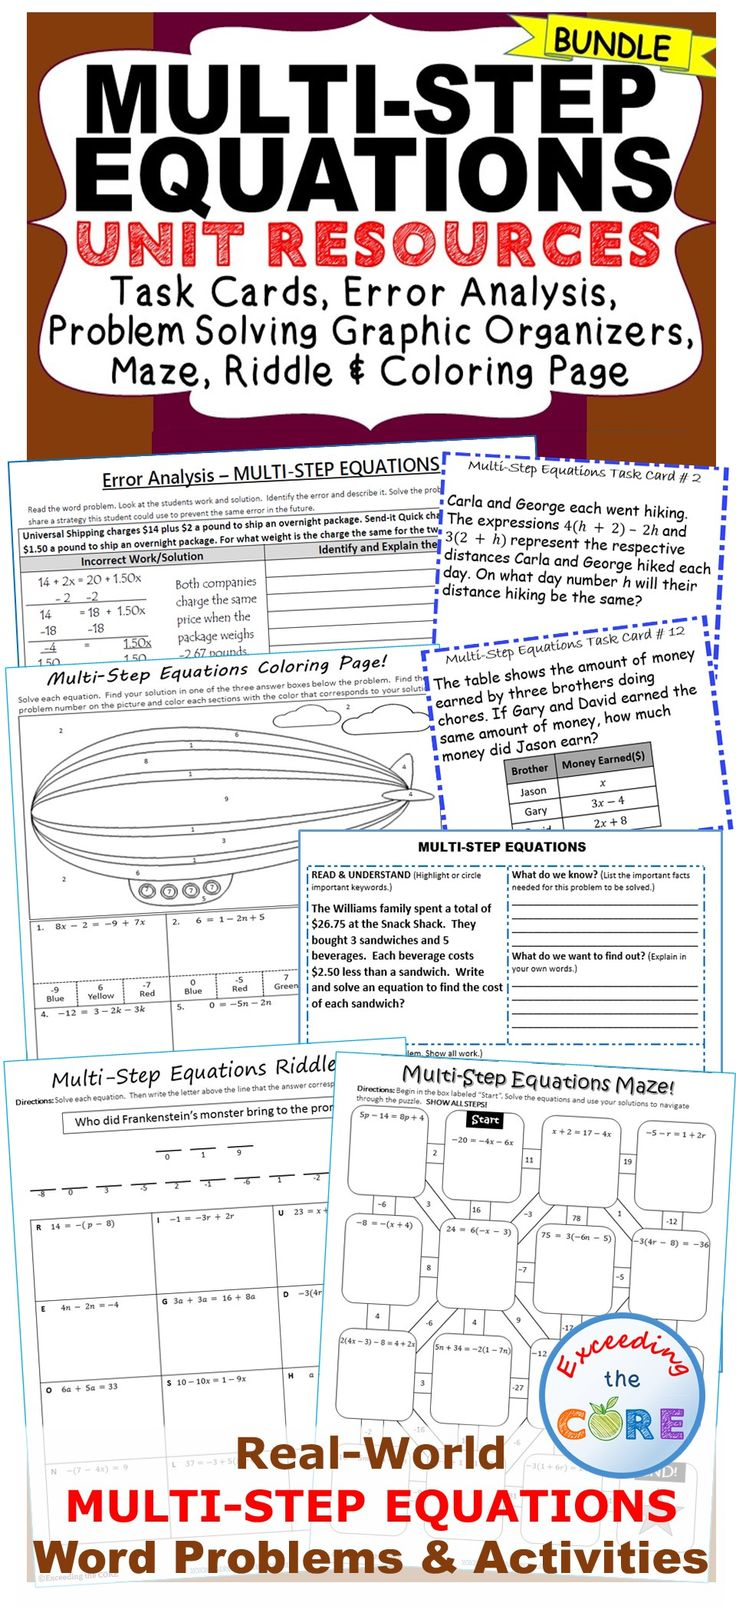 MULTI-STEP EQUATIONS BUNDLE - Task Cards [ 1619 x 736 Pixel ]